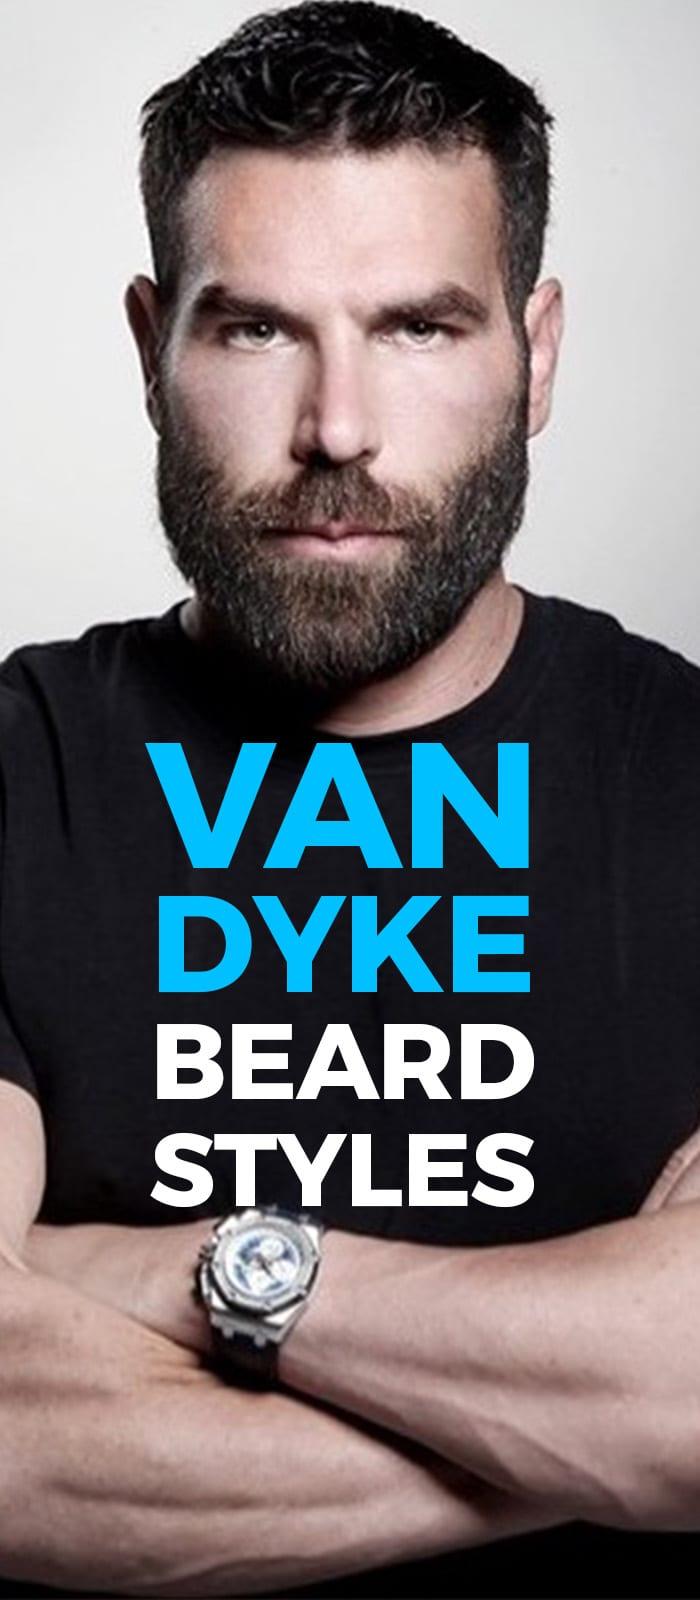 Van Dyke Beard Styles!